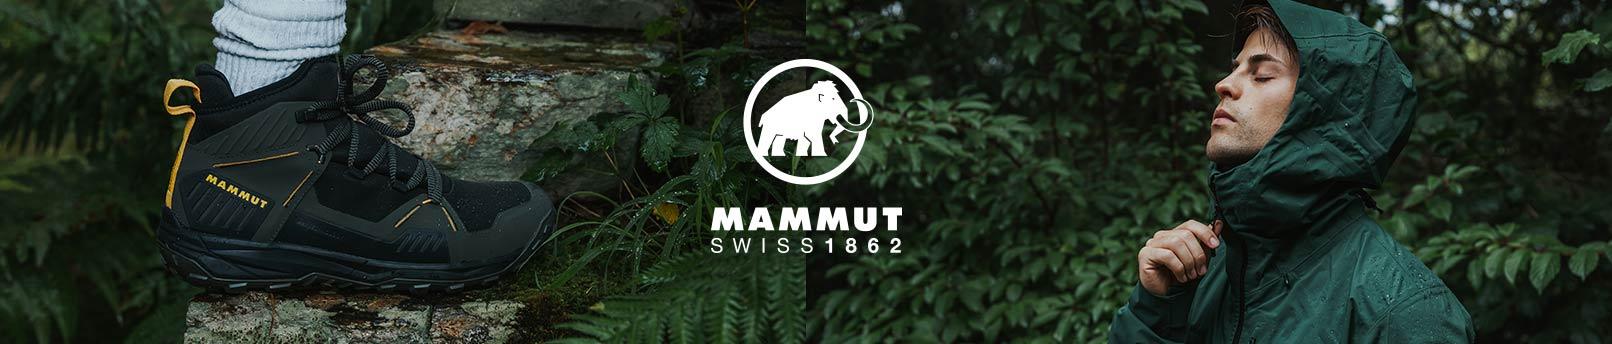 Odkryj Mammut